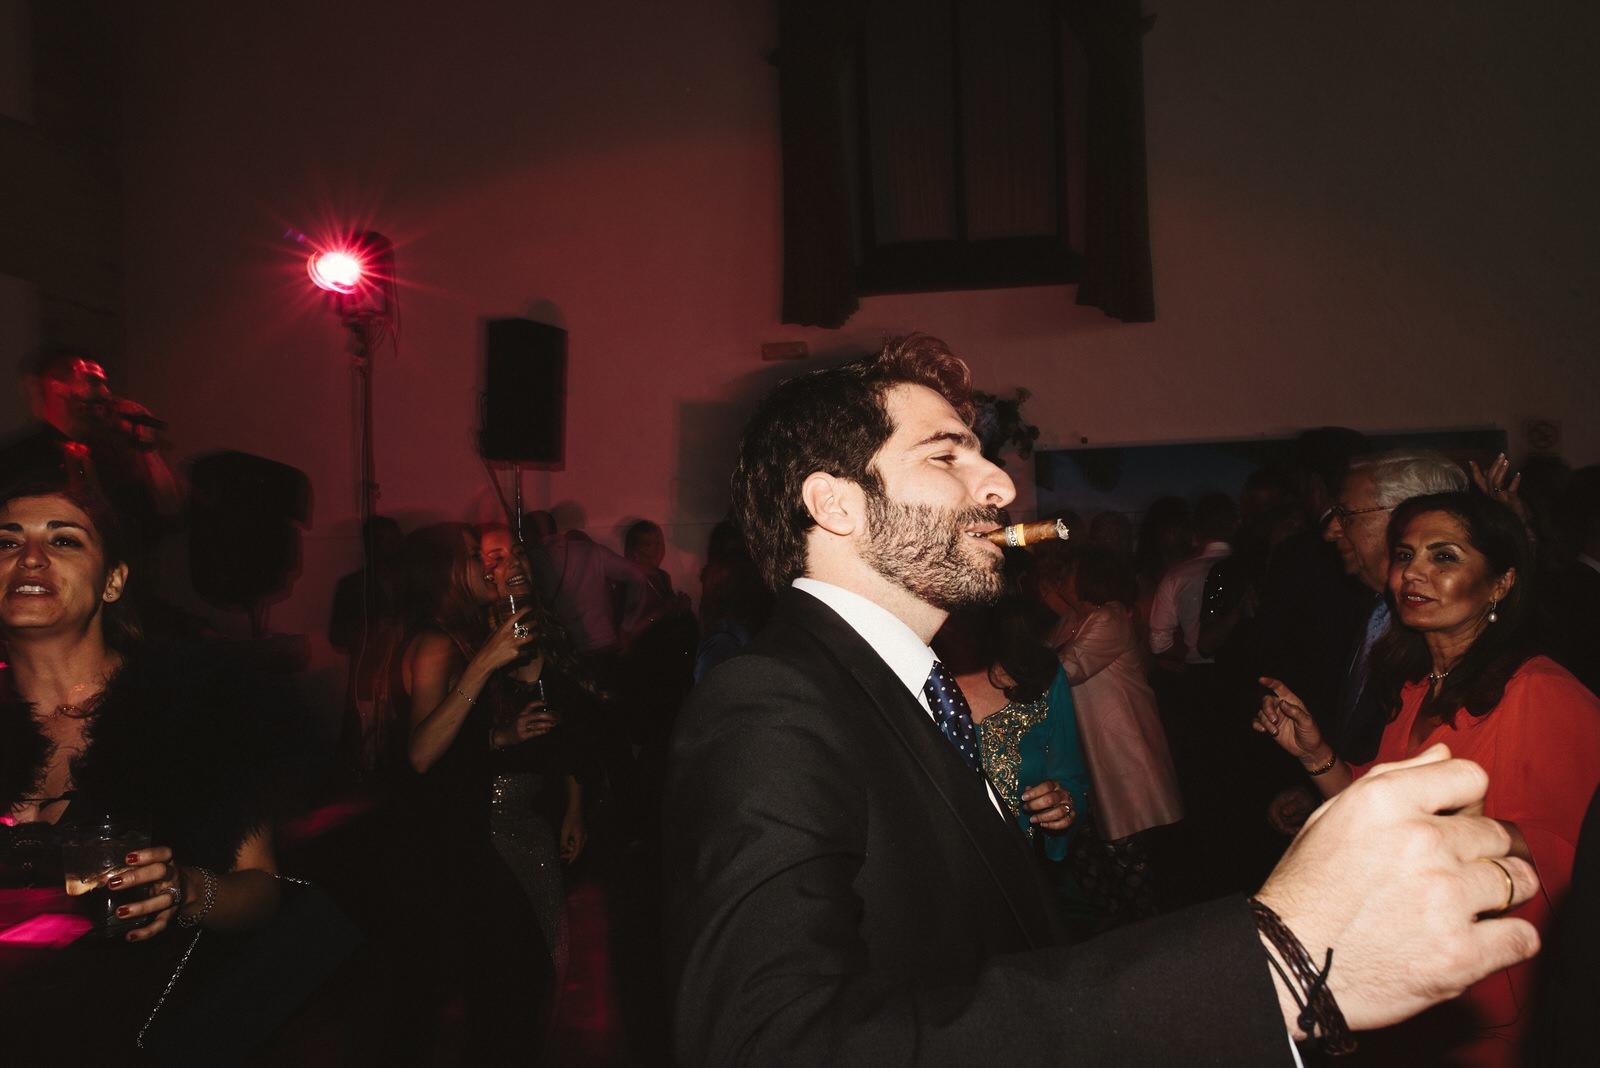 fotografo de bodas sevilla - fotografo boda - fotografía sevilla - Andrés AmarilloAAA_3751- fine.JPG